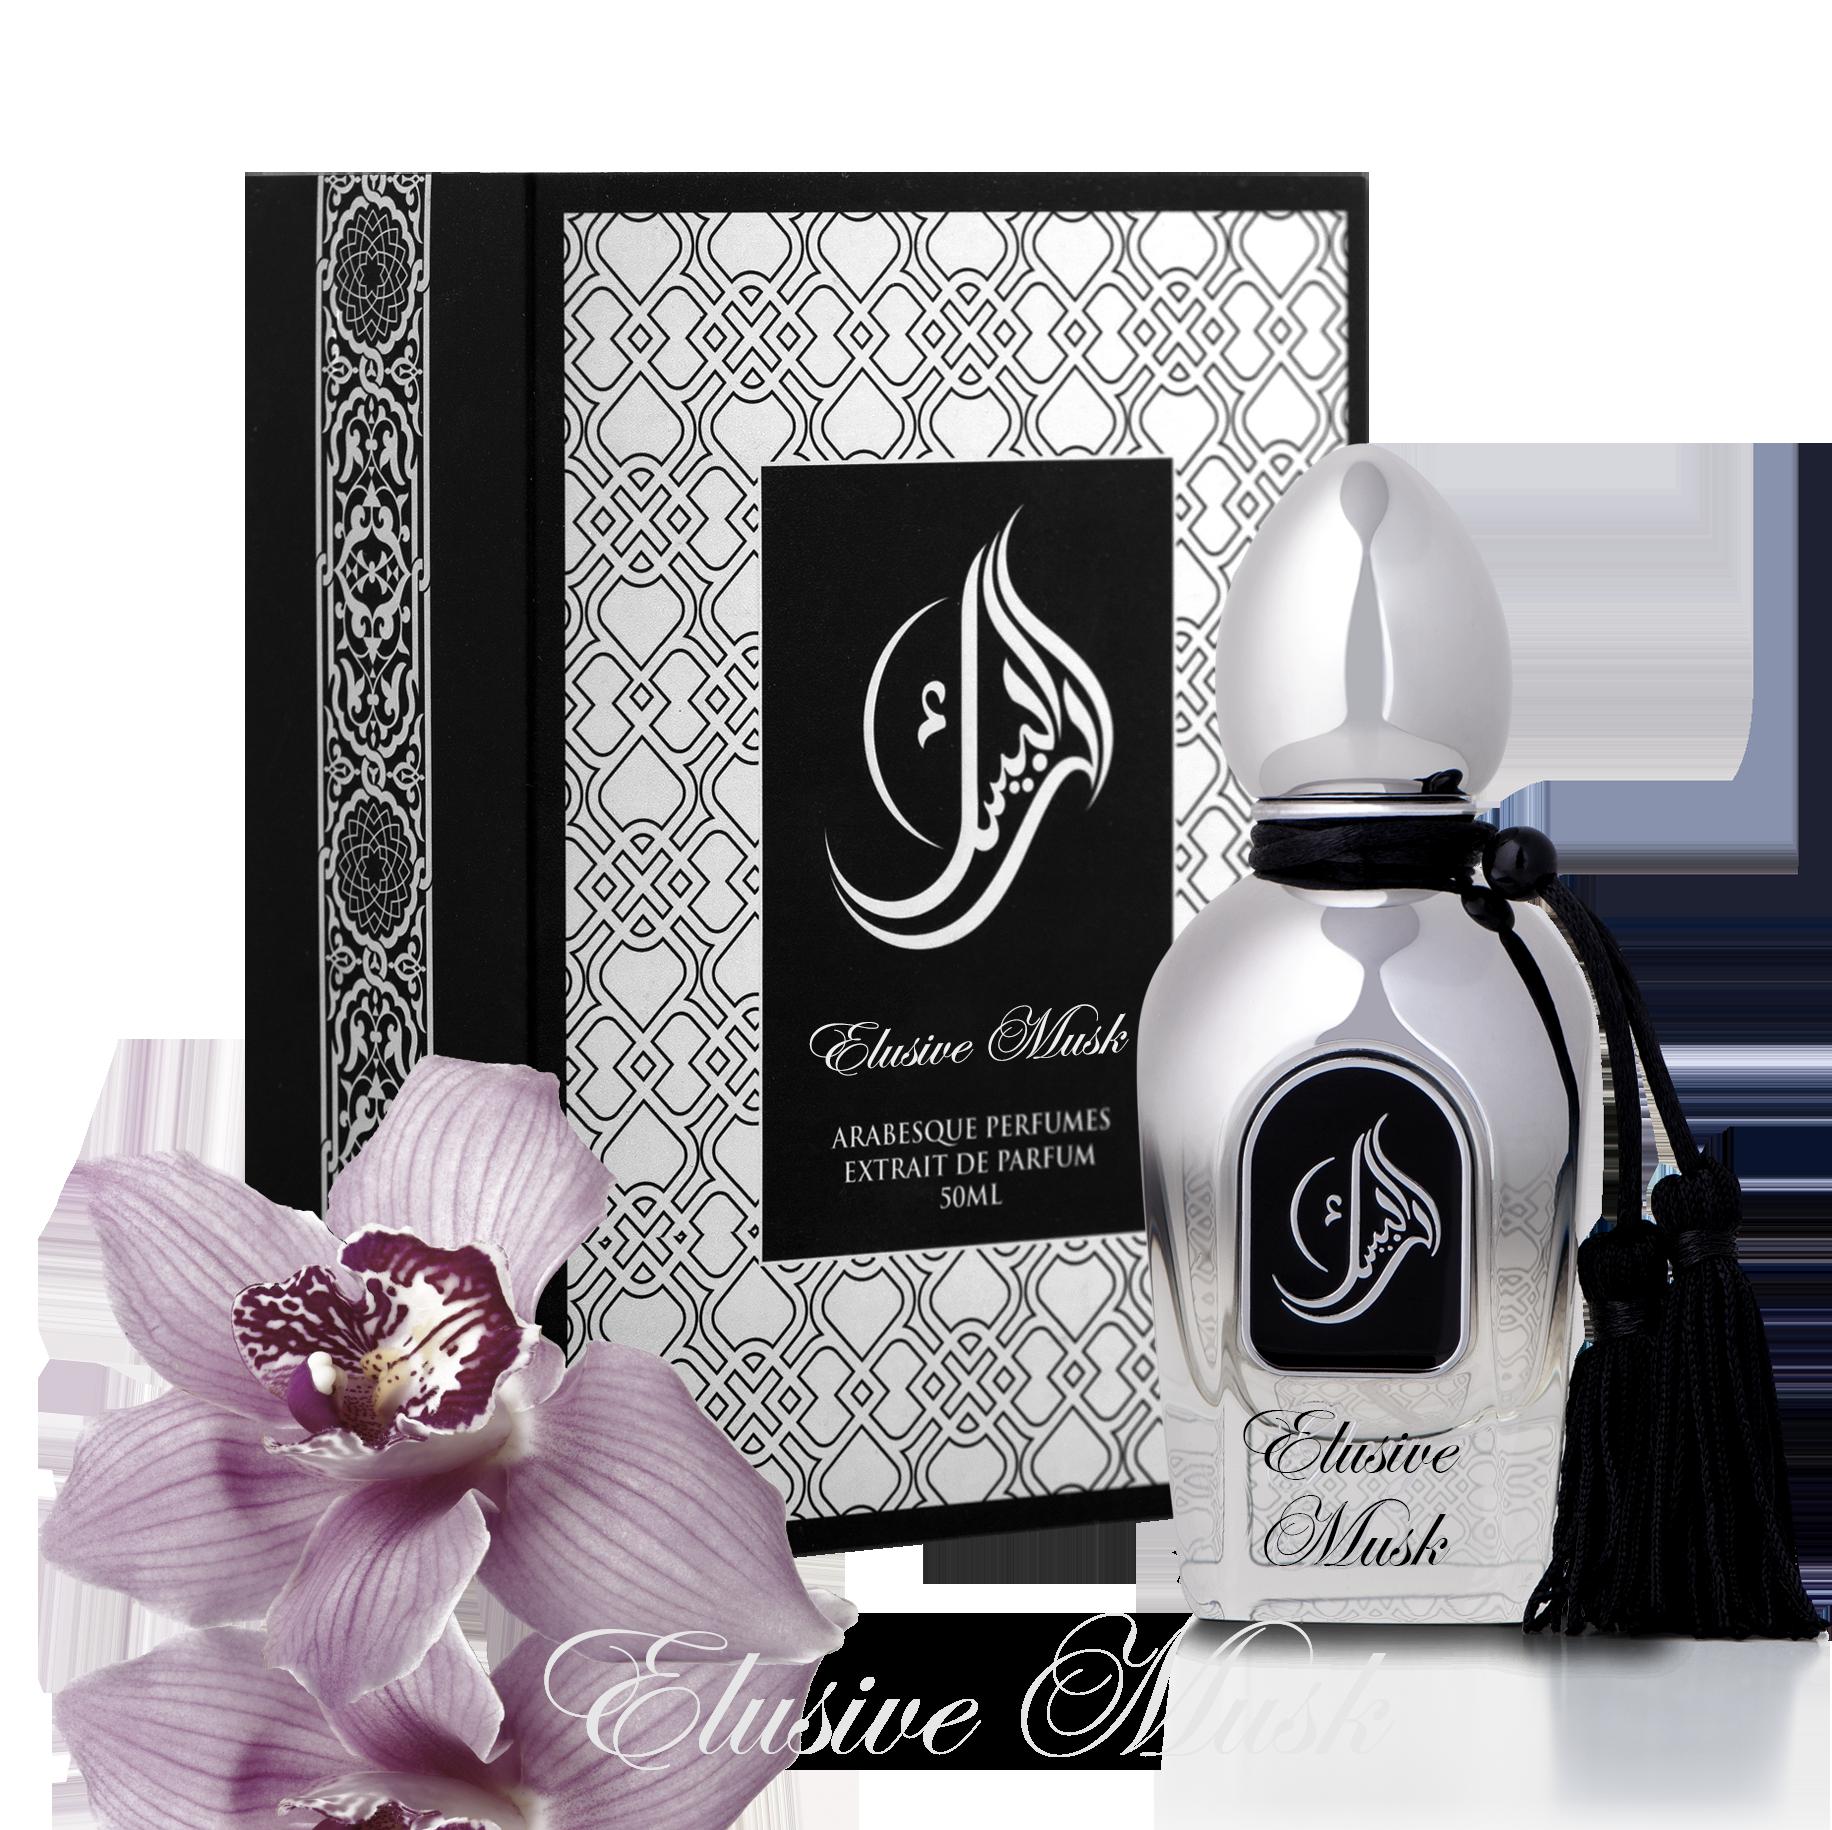 Elusive Musk Arabesque Perfumes Extrait De Parfum ароматы